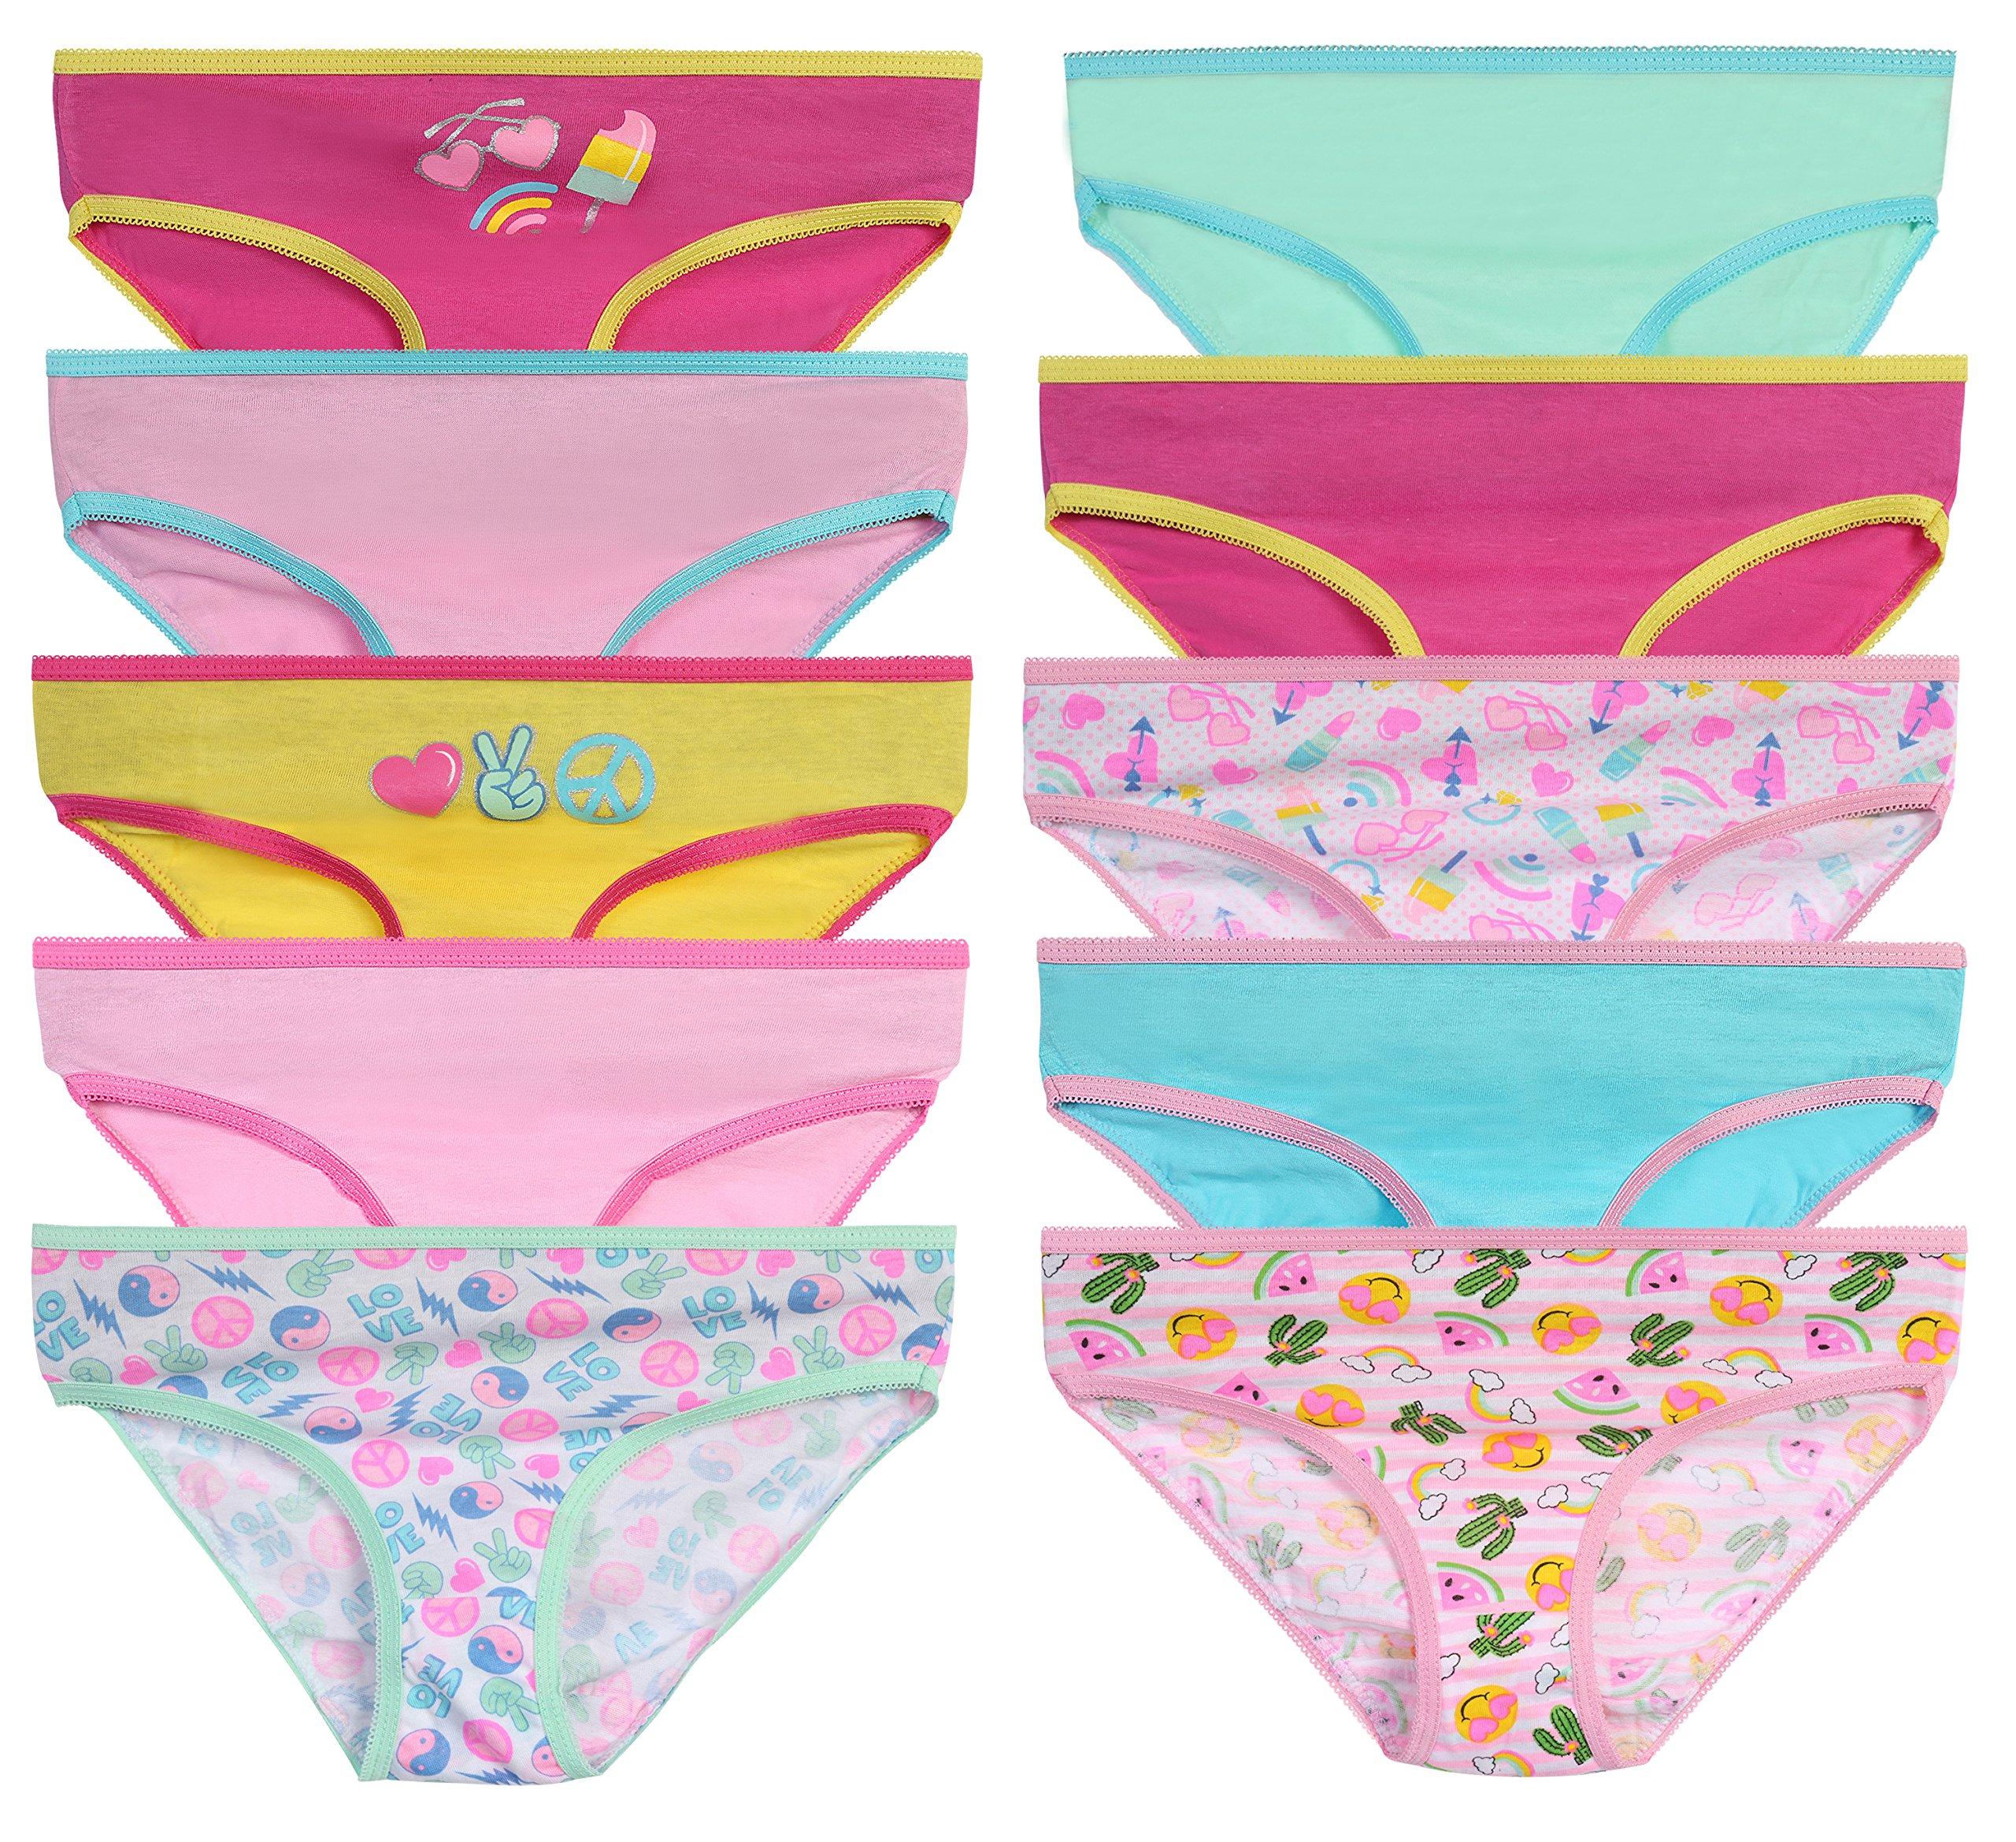 Sweet & Sassy Girls Underwear Panties, Size 4T, Peace, 10 Pack'